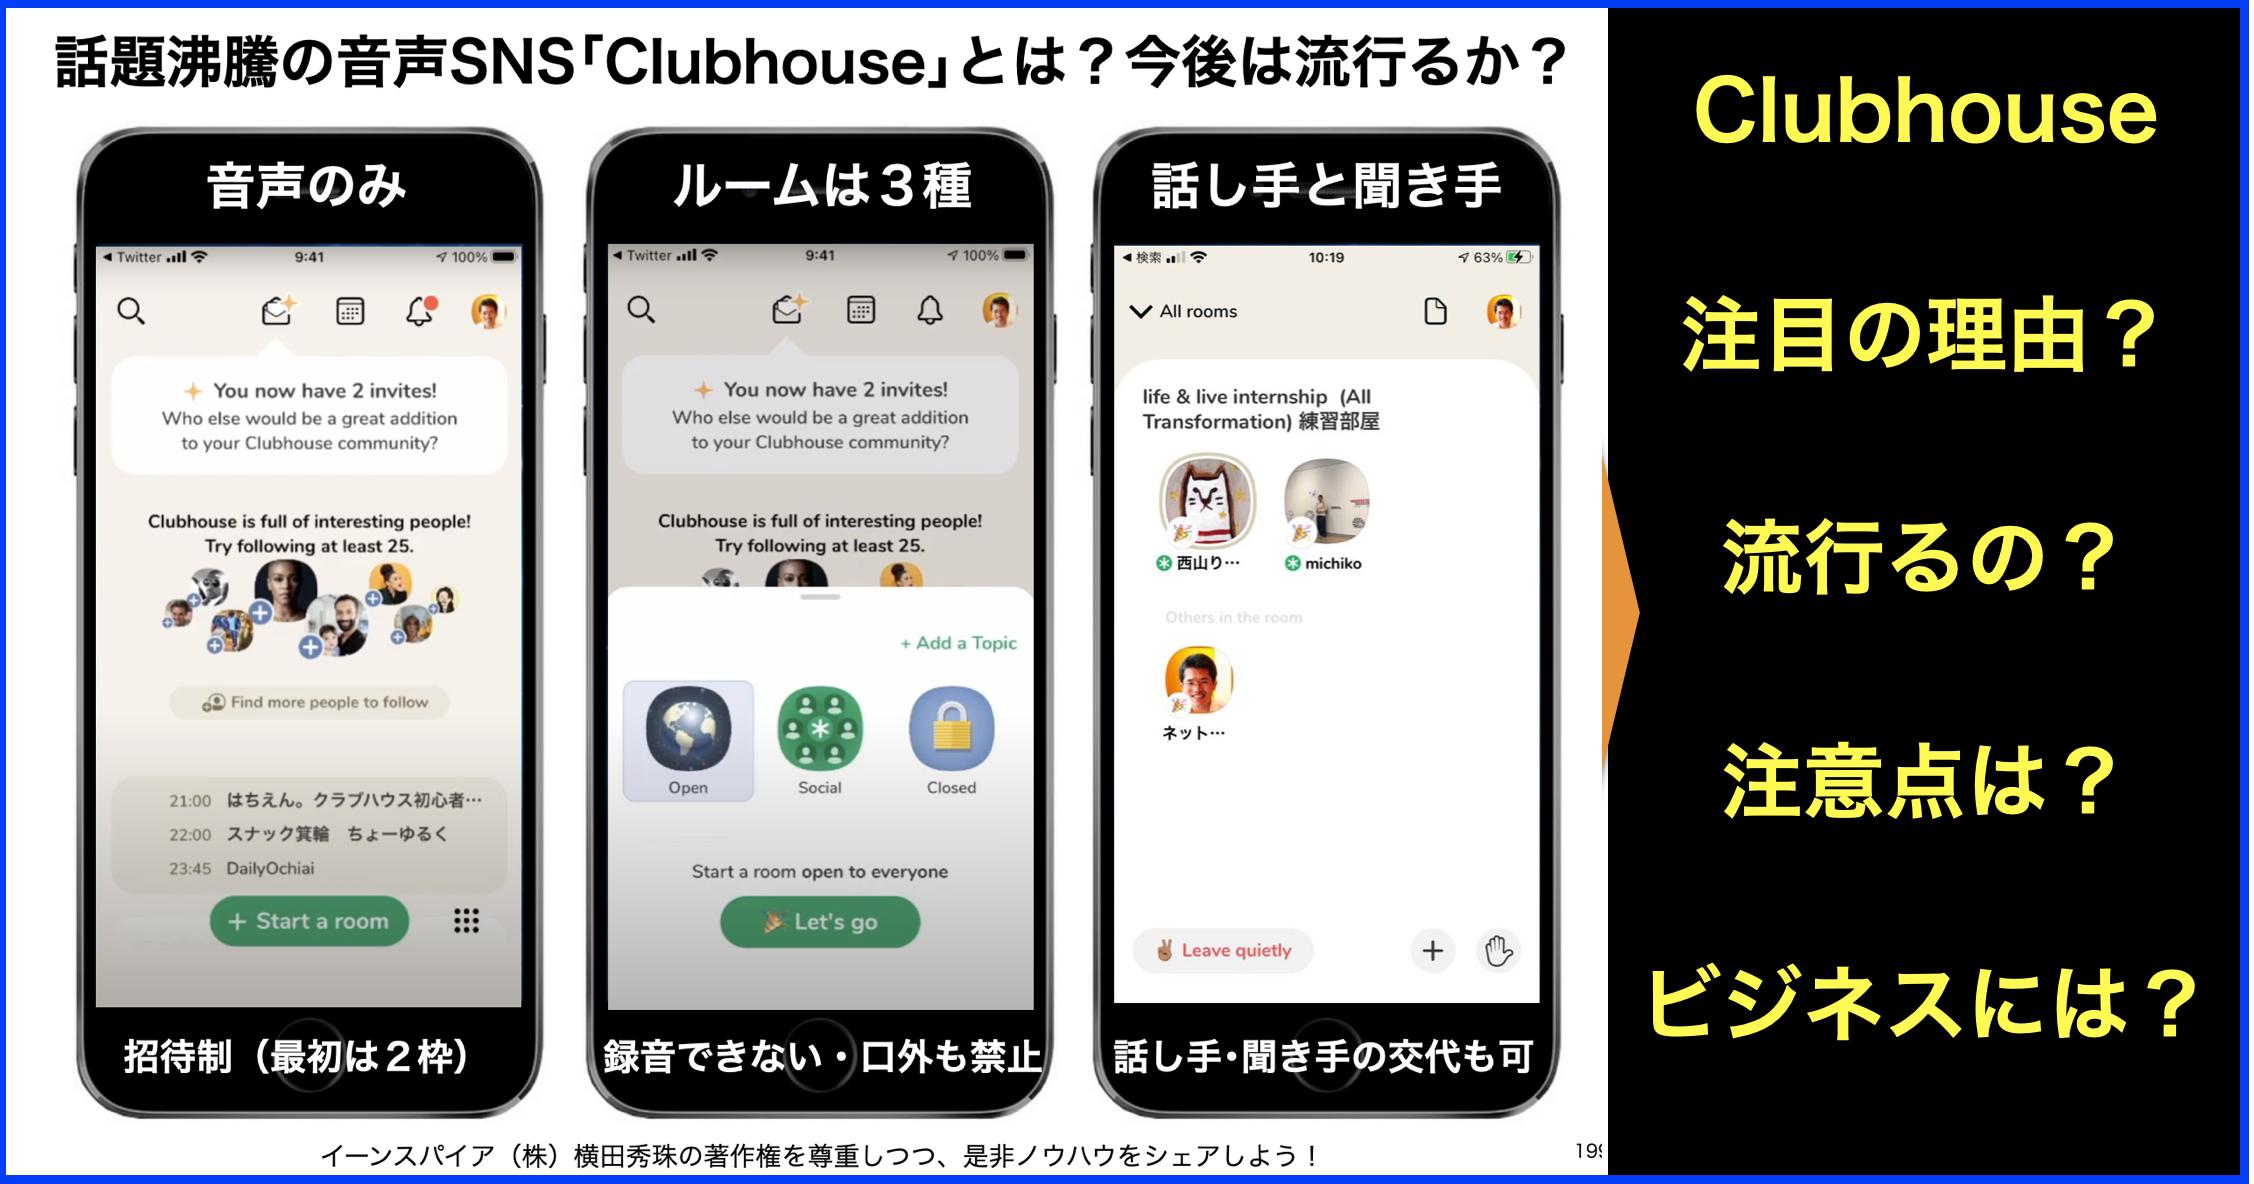 Clubhouse 始め 方 【Clubhouseの始め方】登録から招待方法まで使い方まとめ